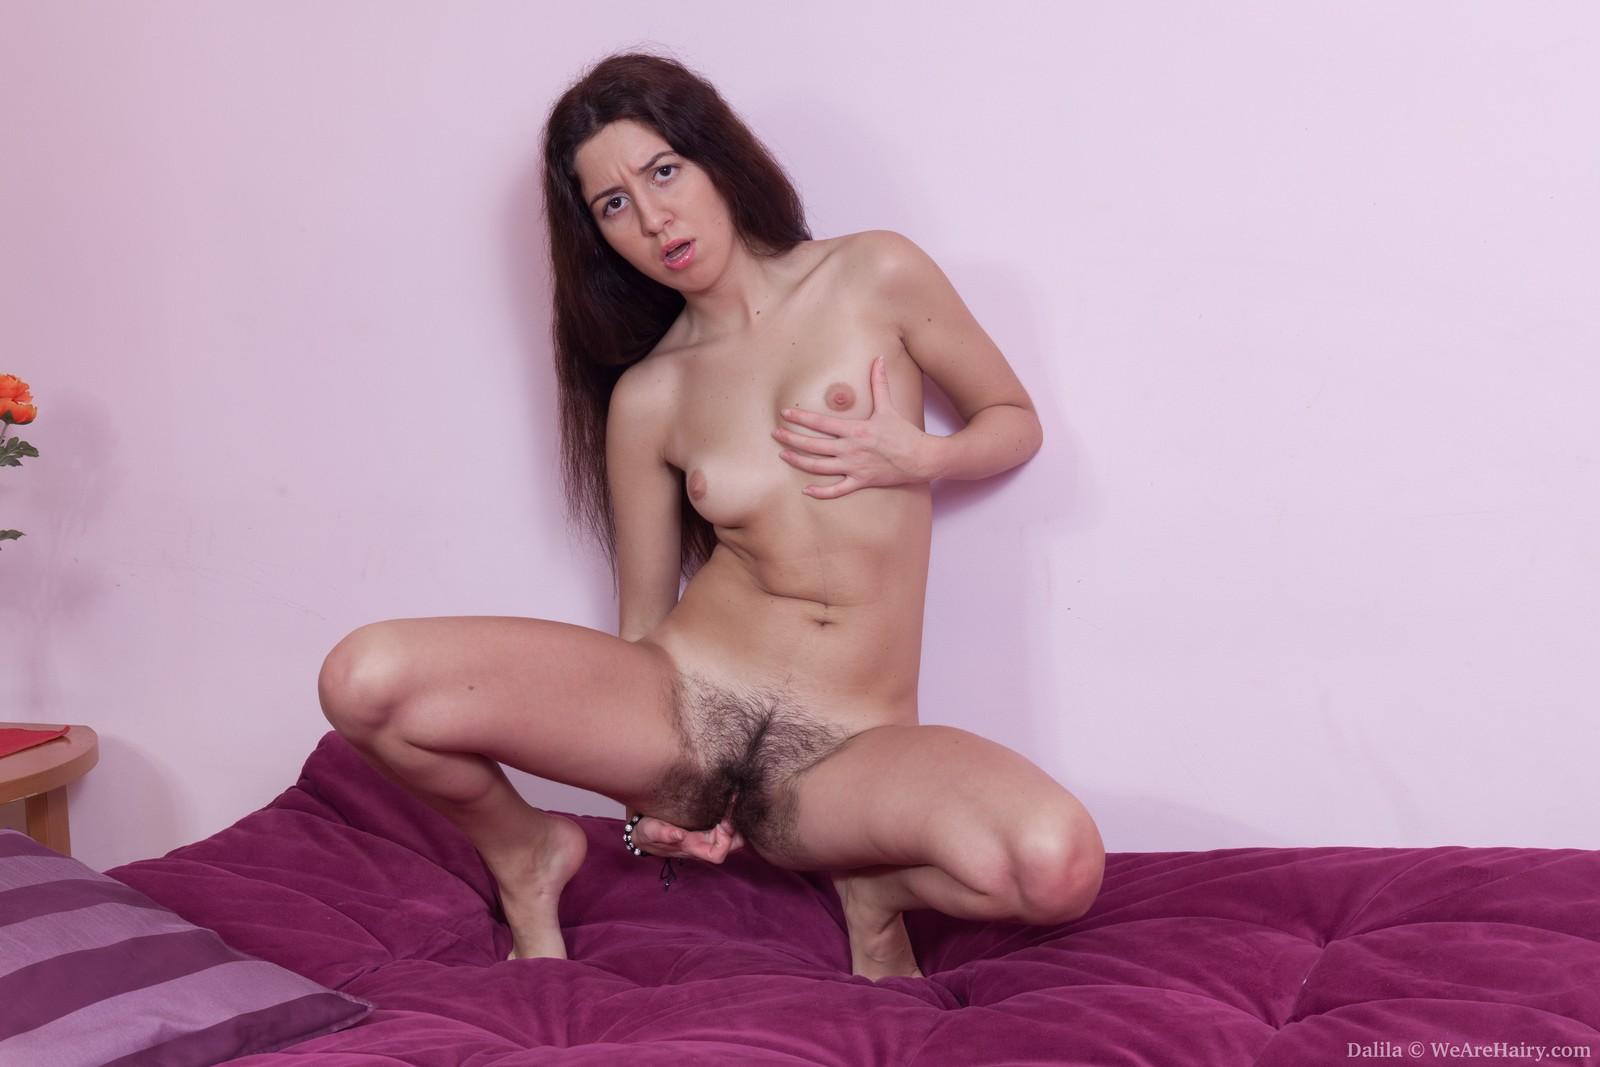 dalila-masturbates-on-her-purple-sofa12.jpg